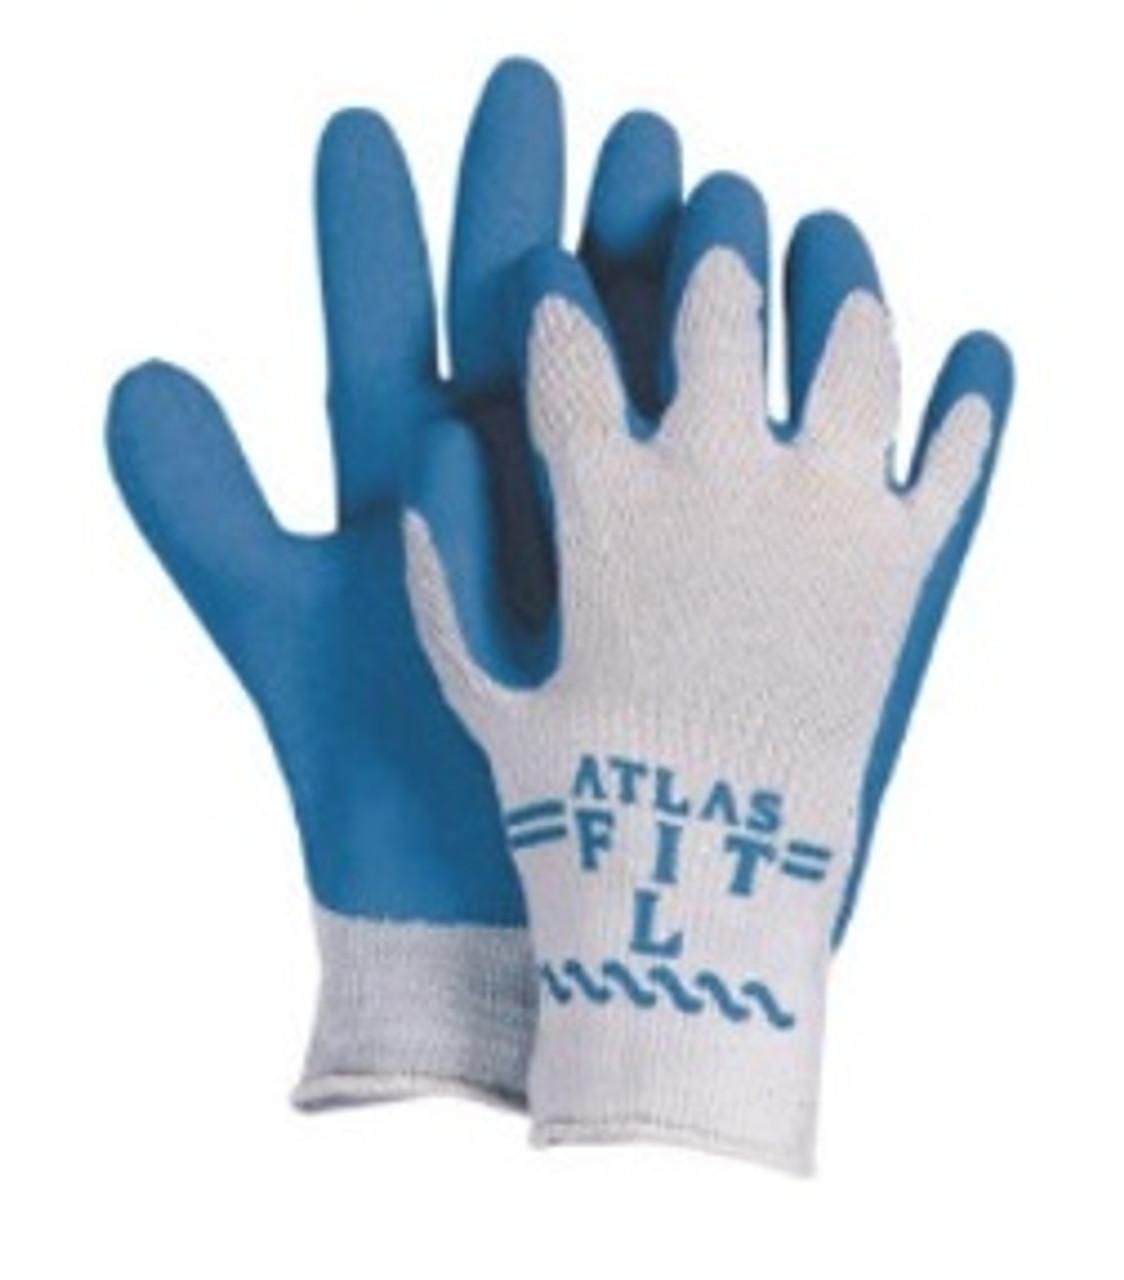 ATLAS BLUE FLEX GLOVE-LARGE